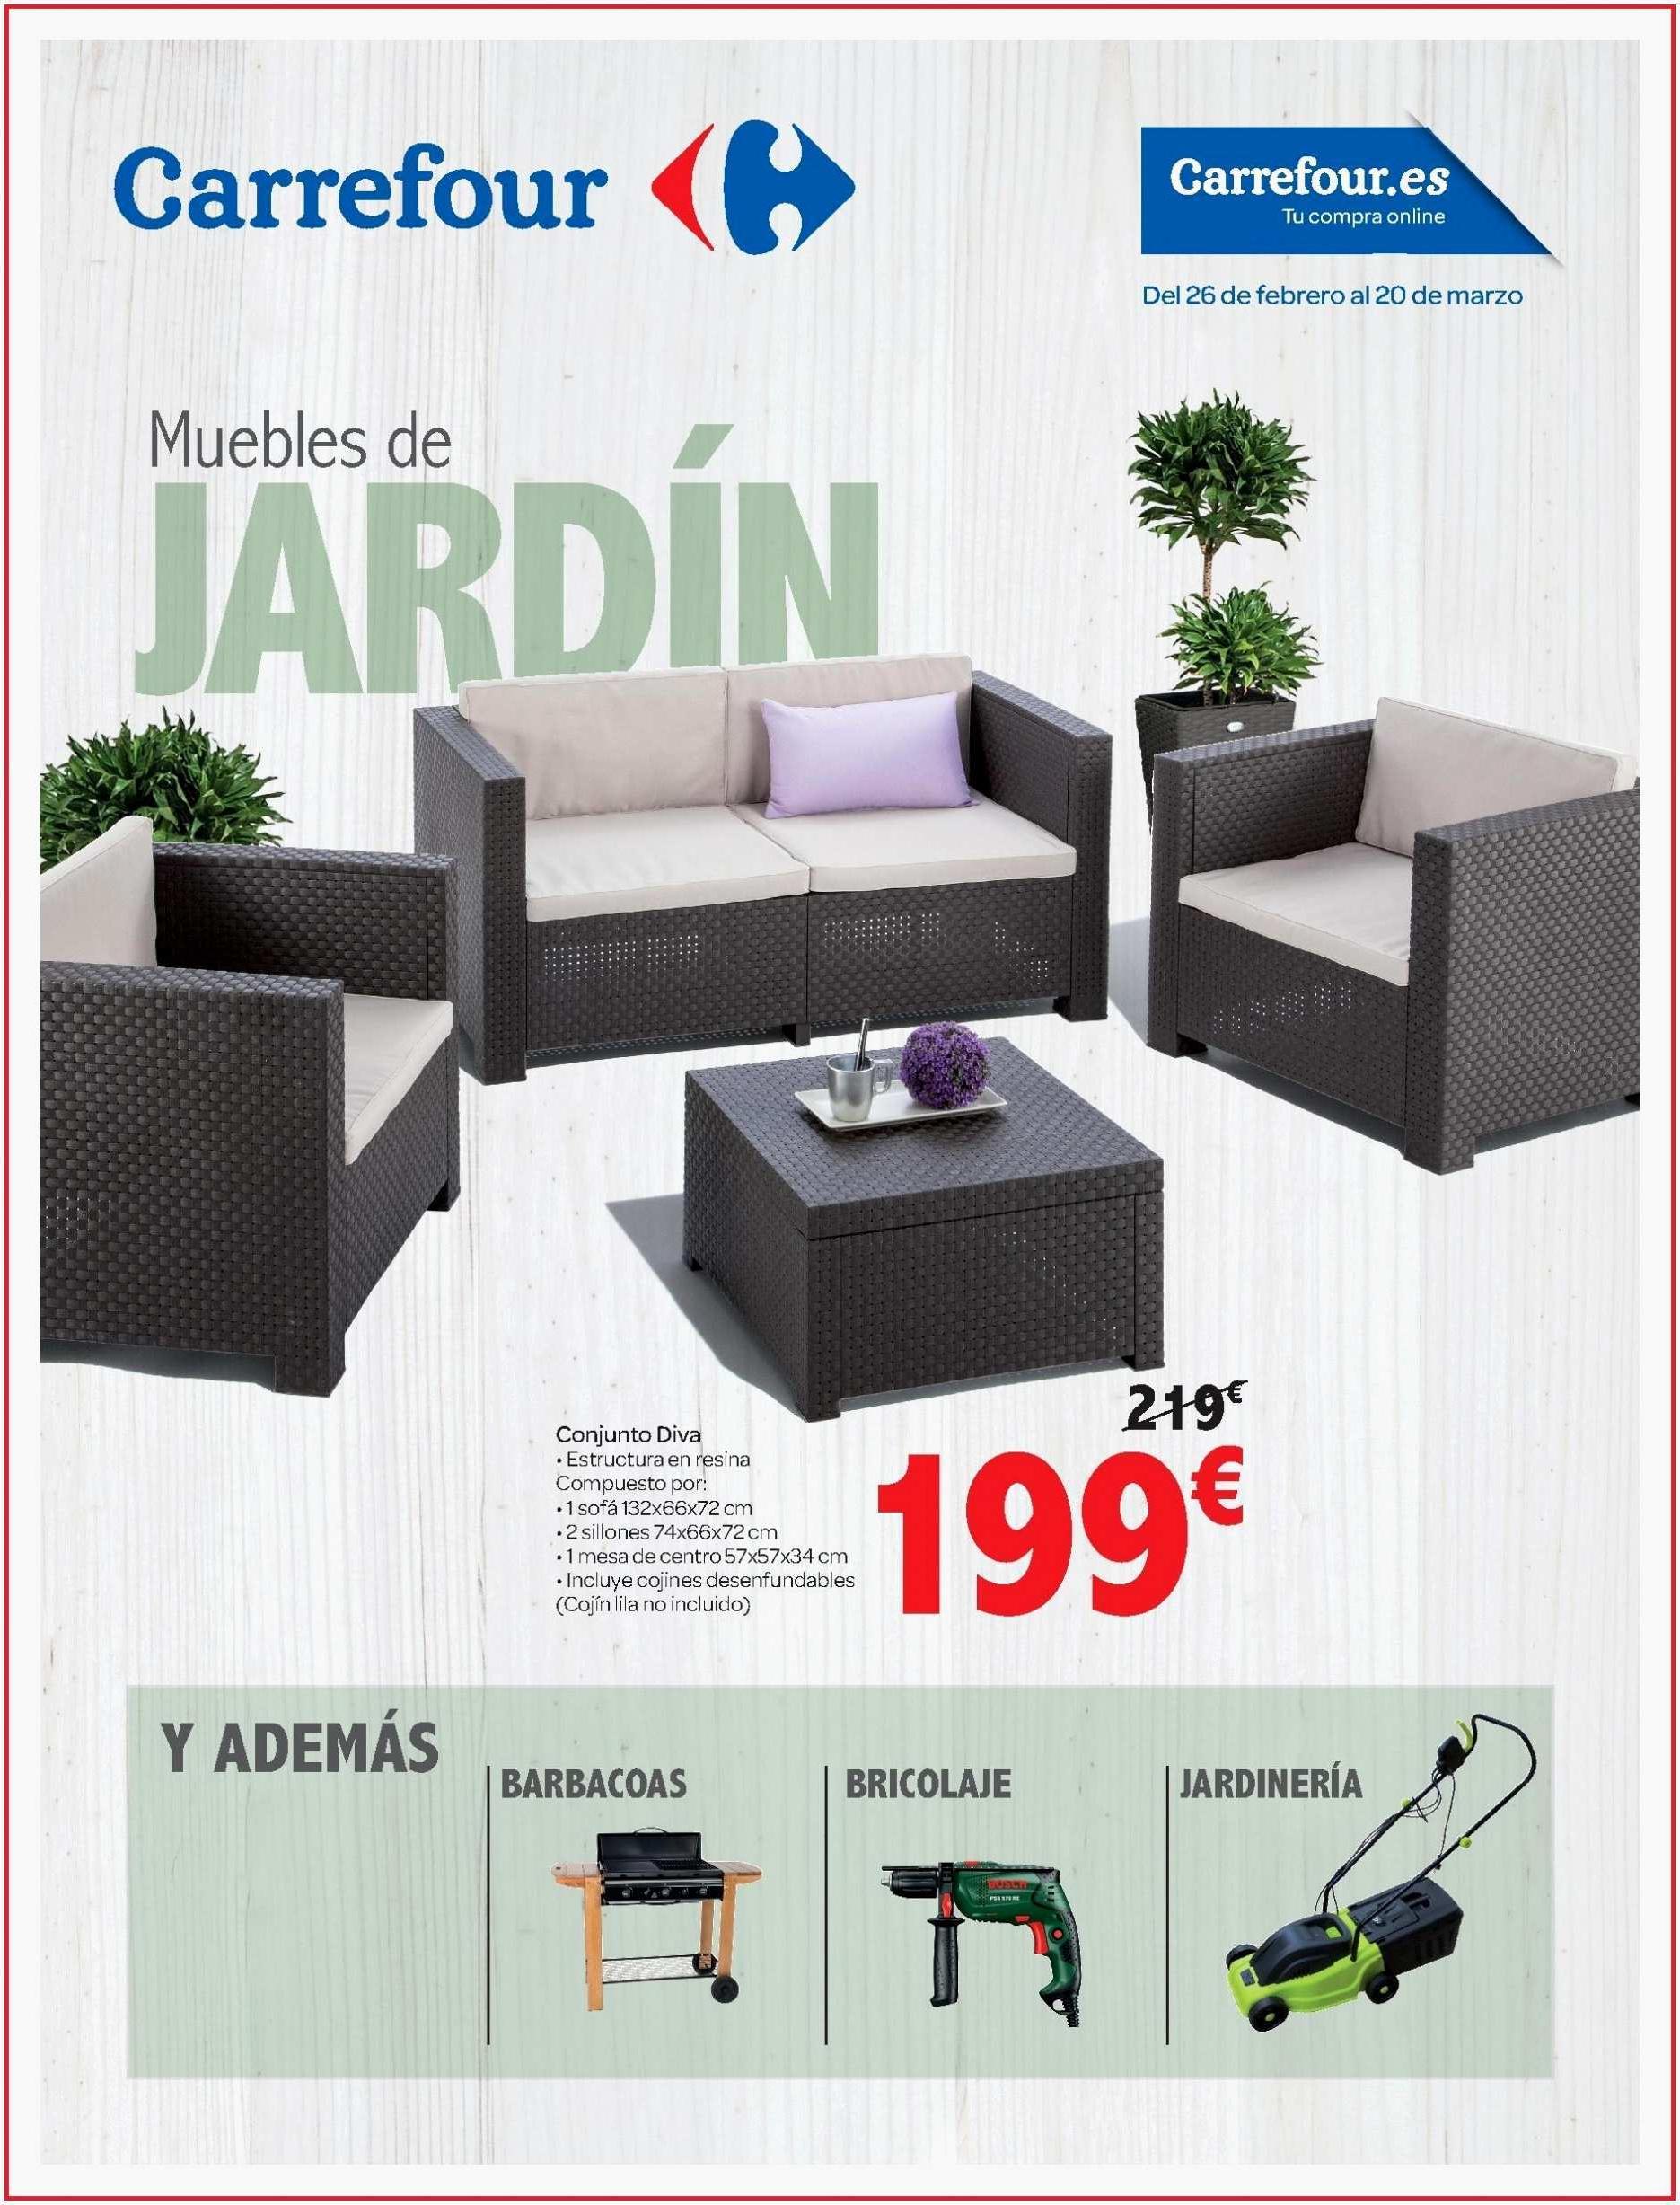 Sillas Jardin Carrefour E9dx Decorar Un Edor En El Jardin Bron Vtwonen 07 2017